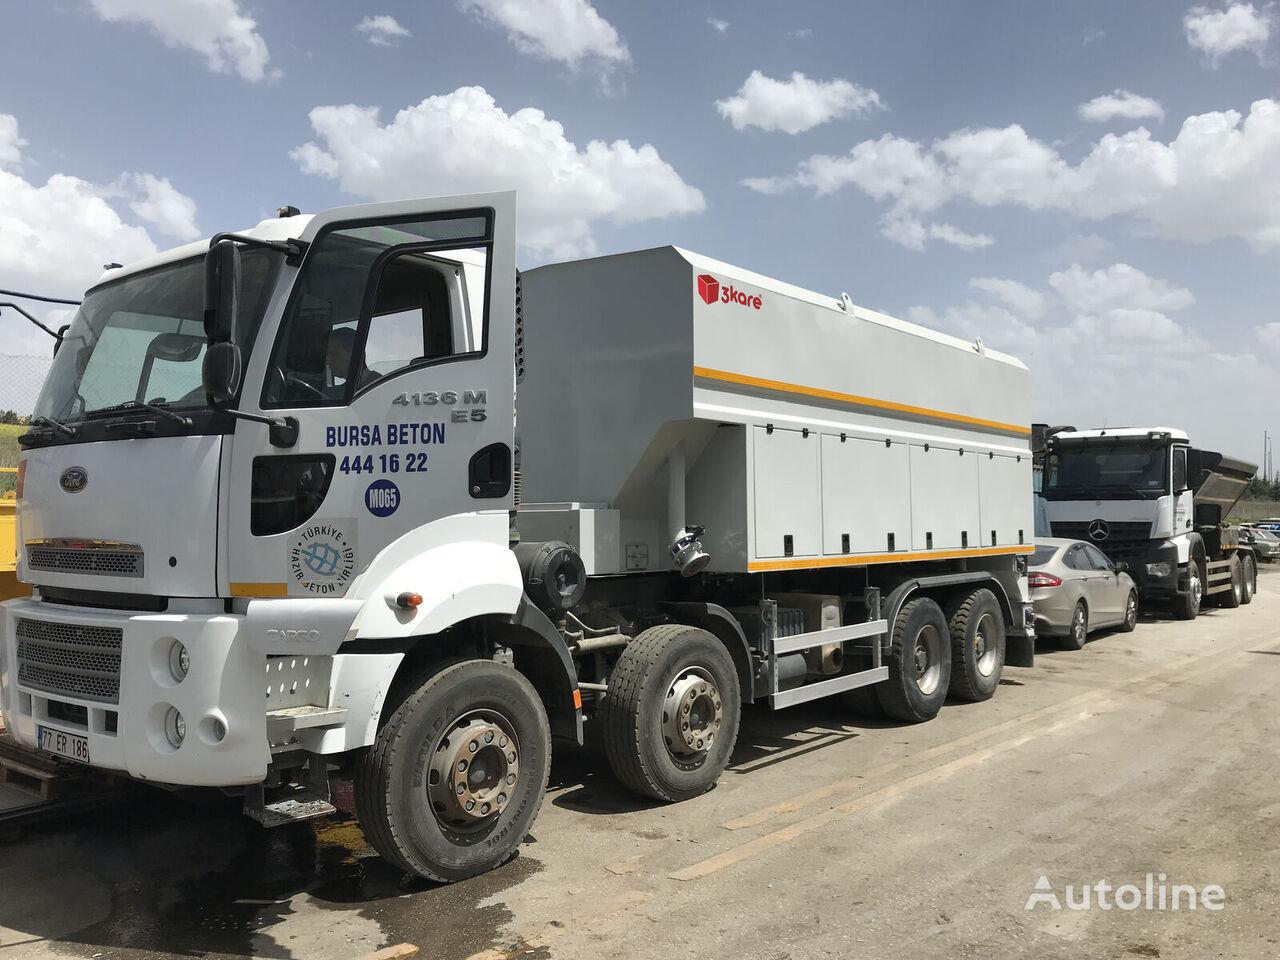 3Kare Toz Malzeme Serici / Çimento Serici camión cisterna de cemento nuevo